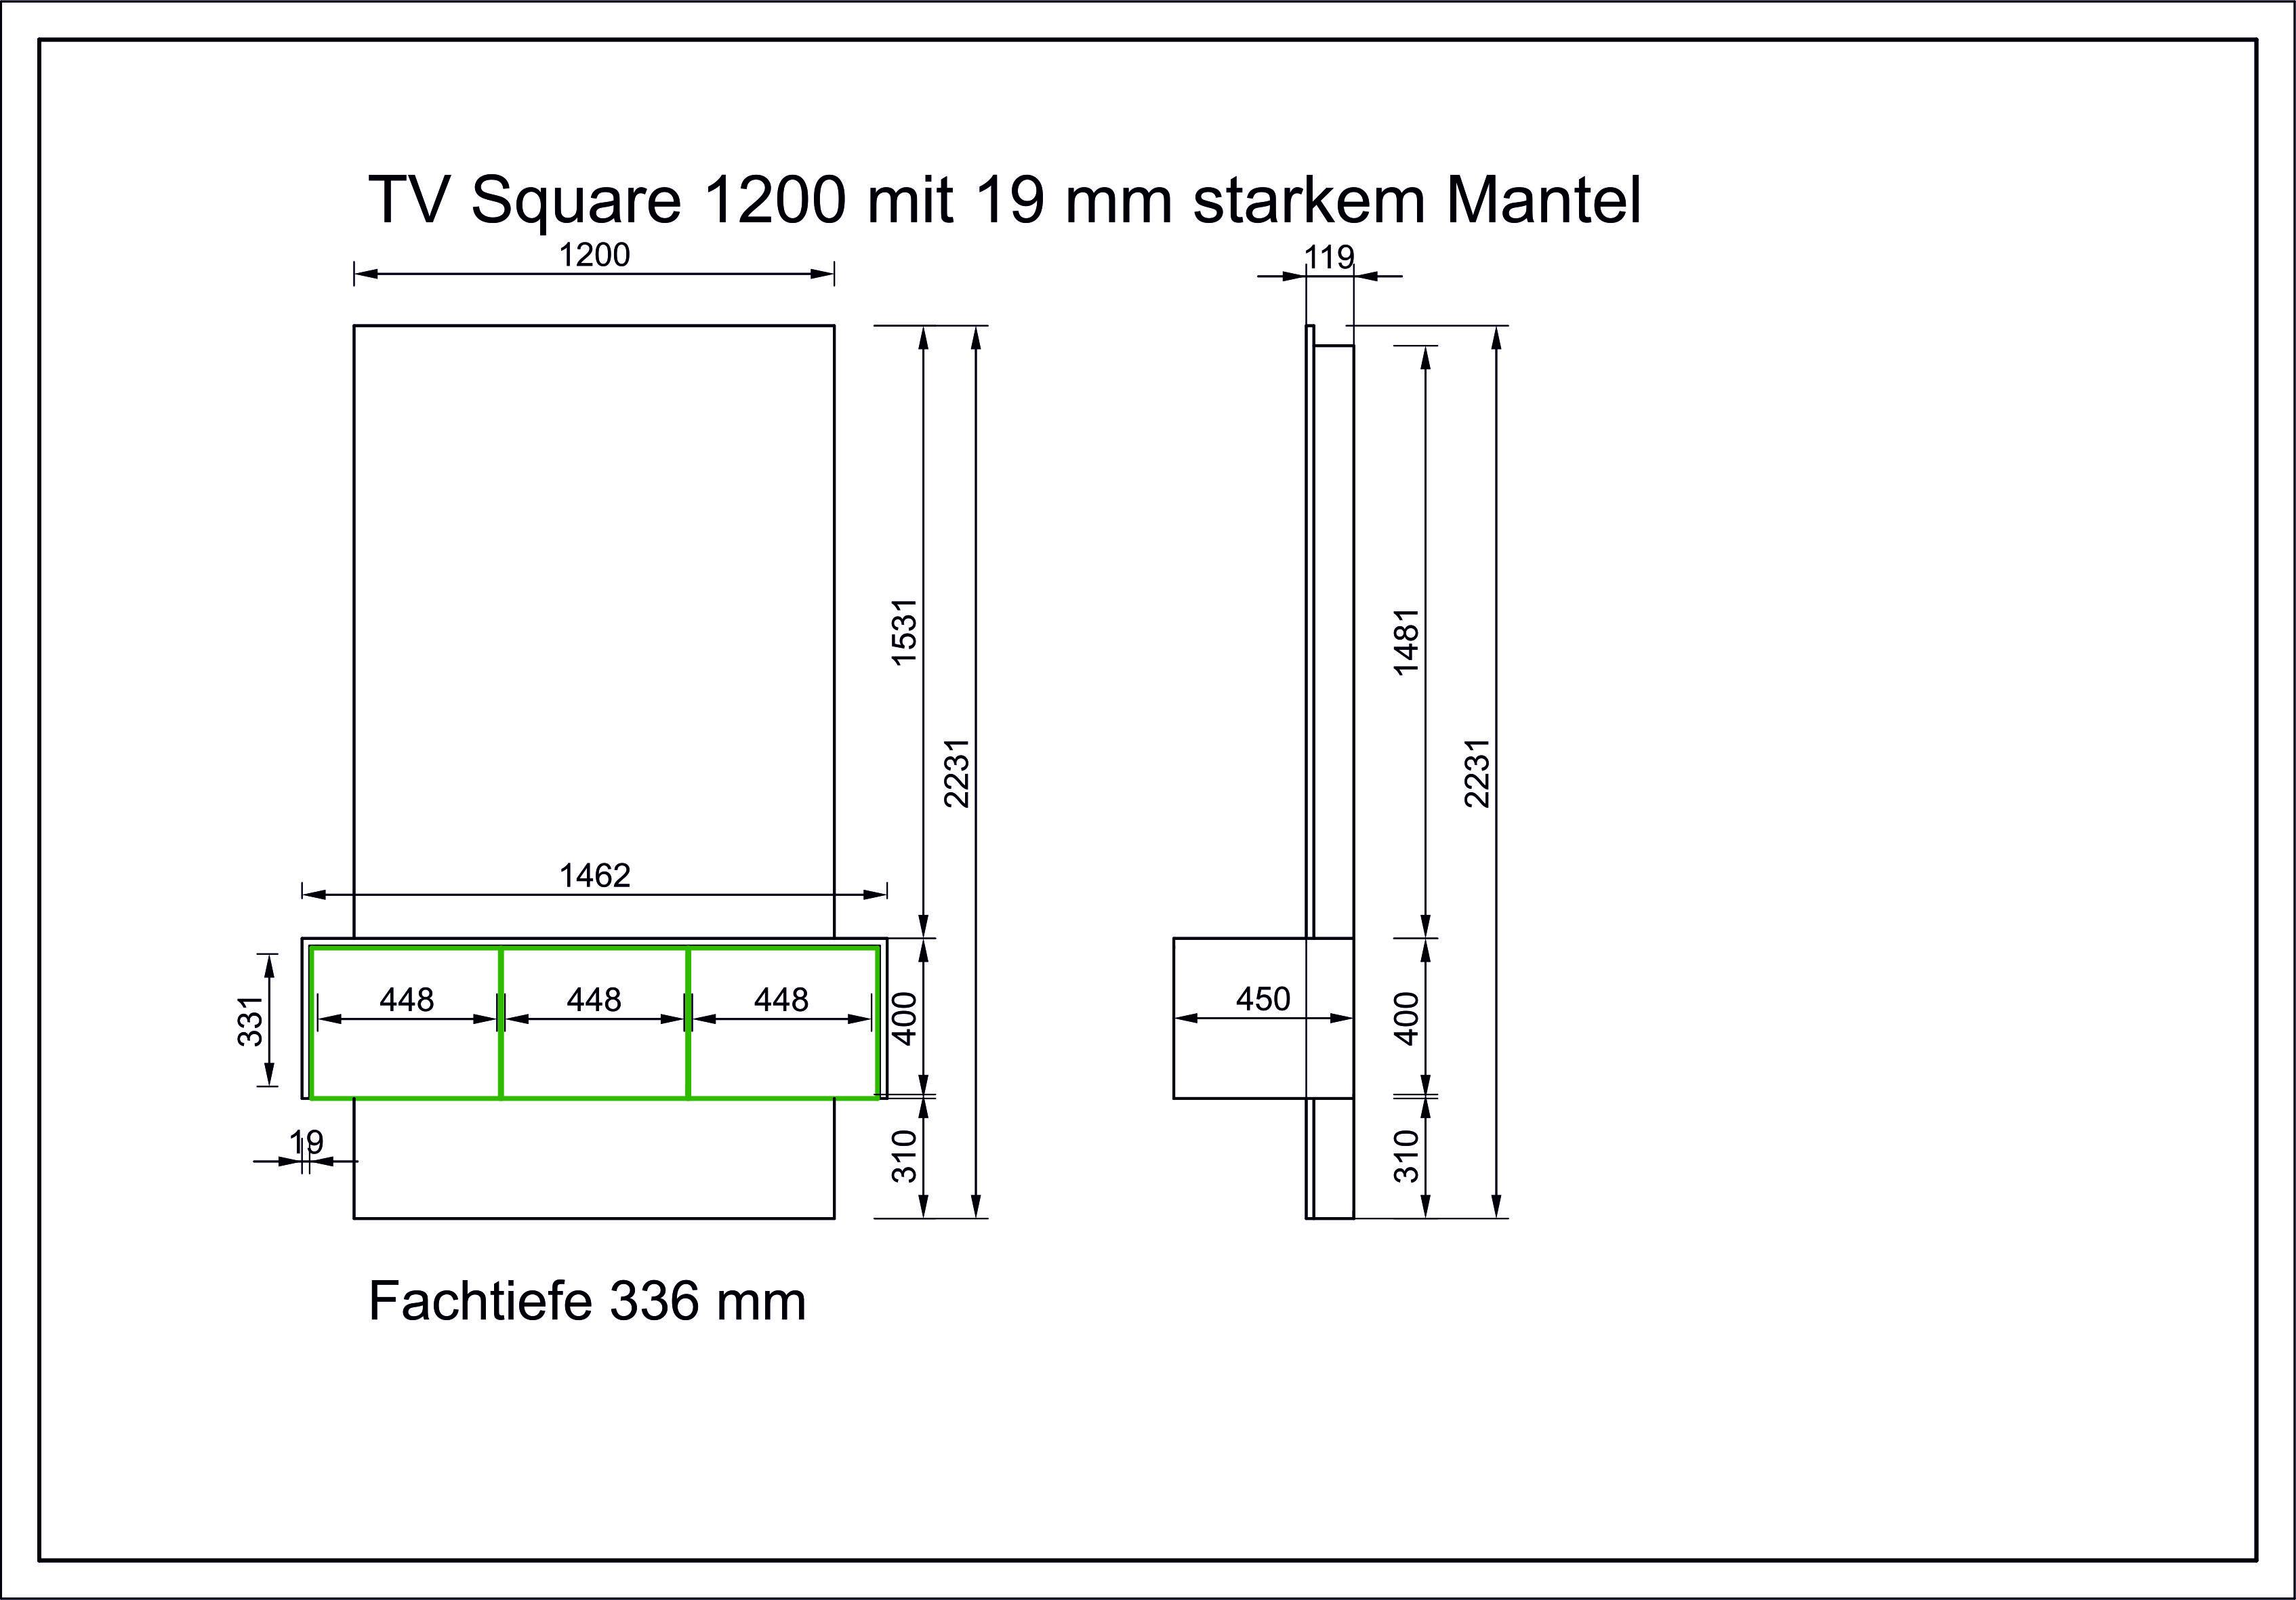 TV-Square-1200mm-mit-19mm-MantelSeRNSXFj5Wk2C